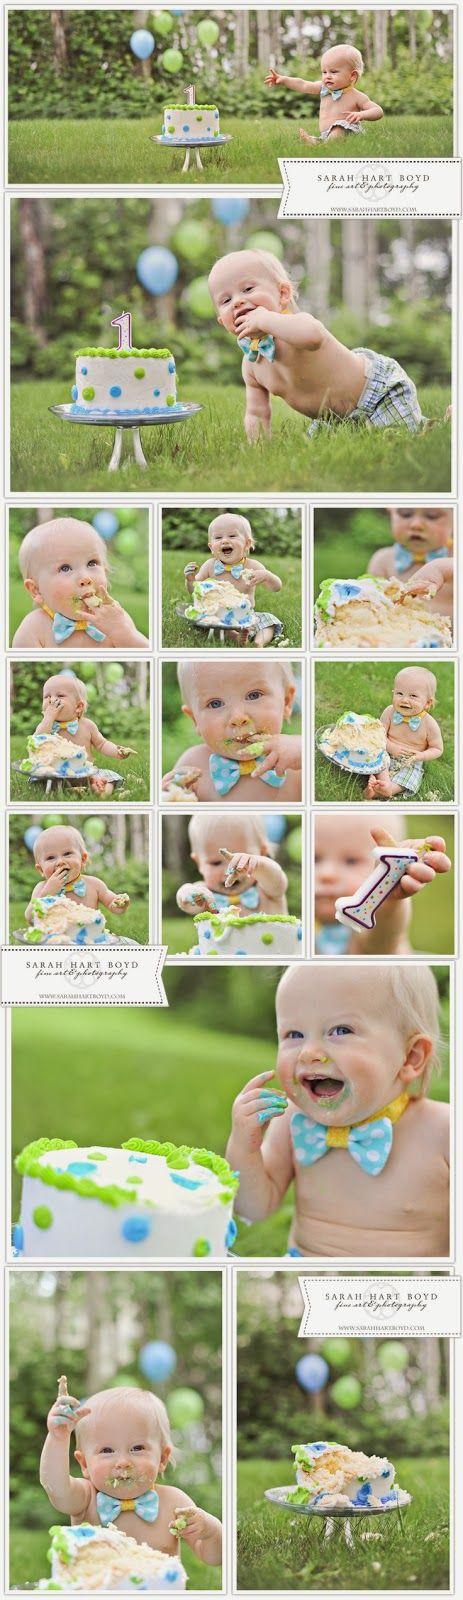 First Birthday Cake Smash Photo Session